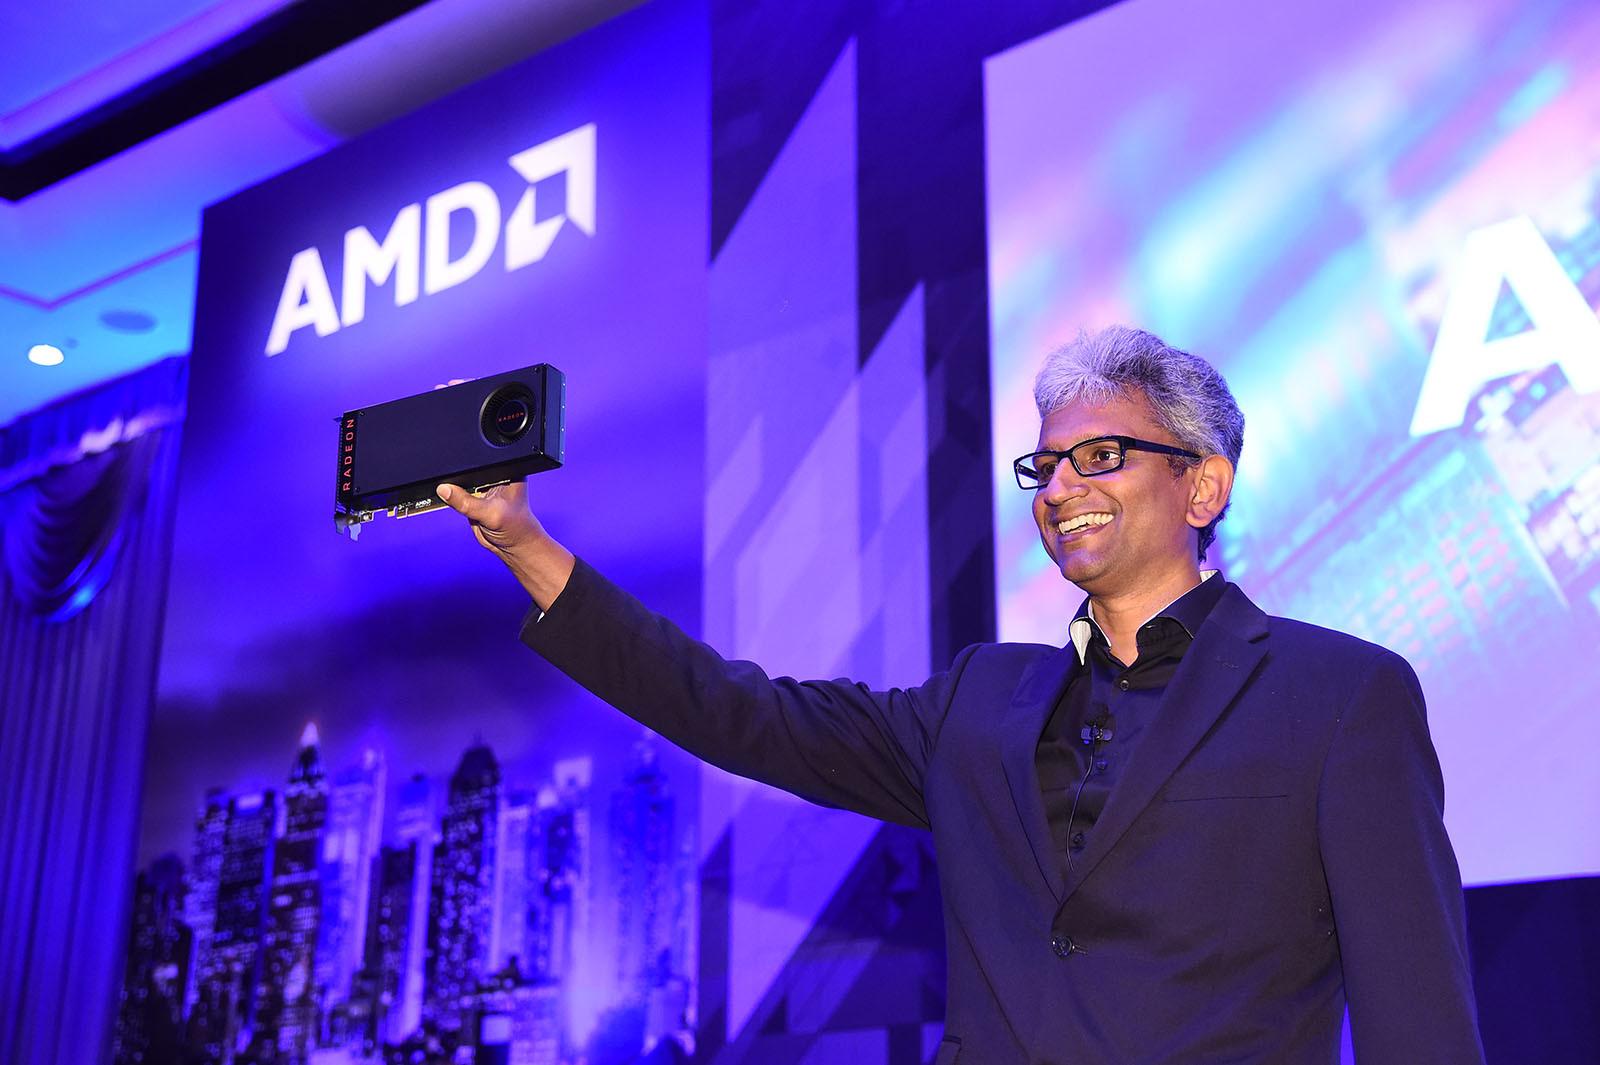 آقای راجا کودوری بصورت موقت AMD RTG را ترک خواهد کرد!